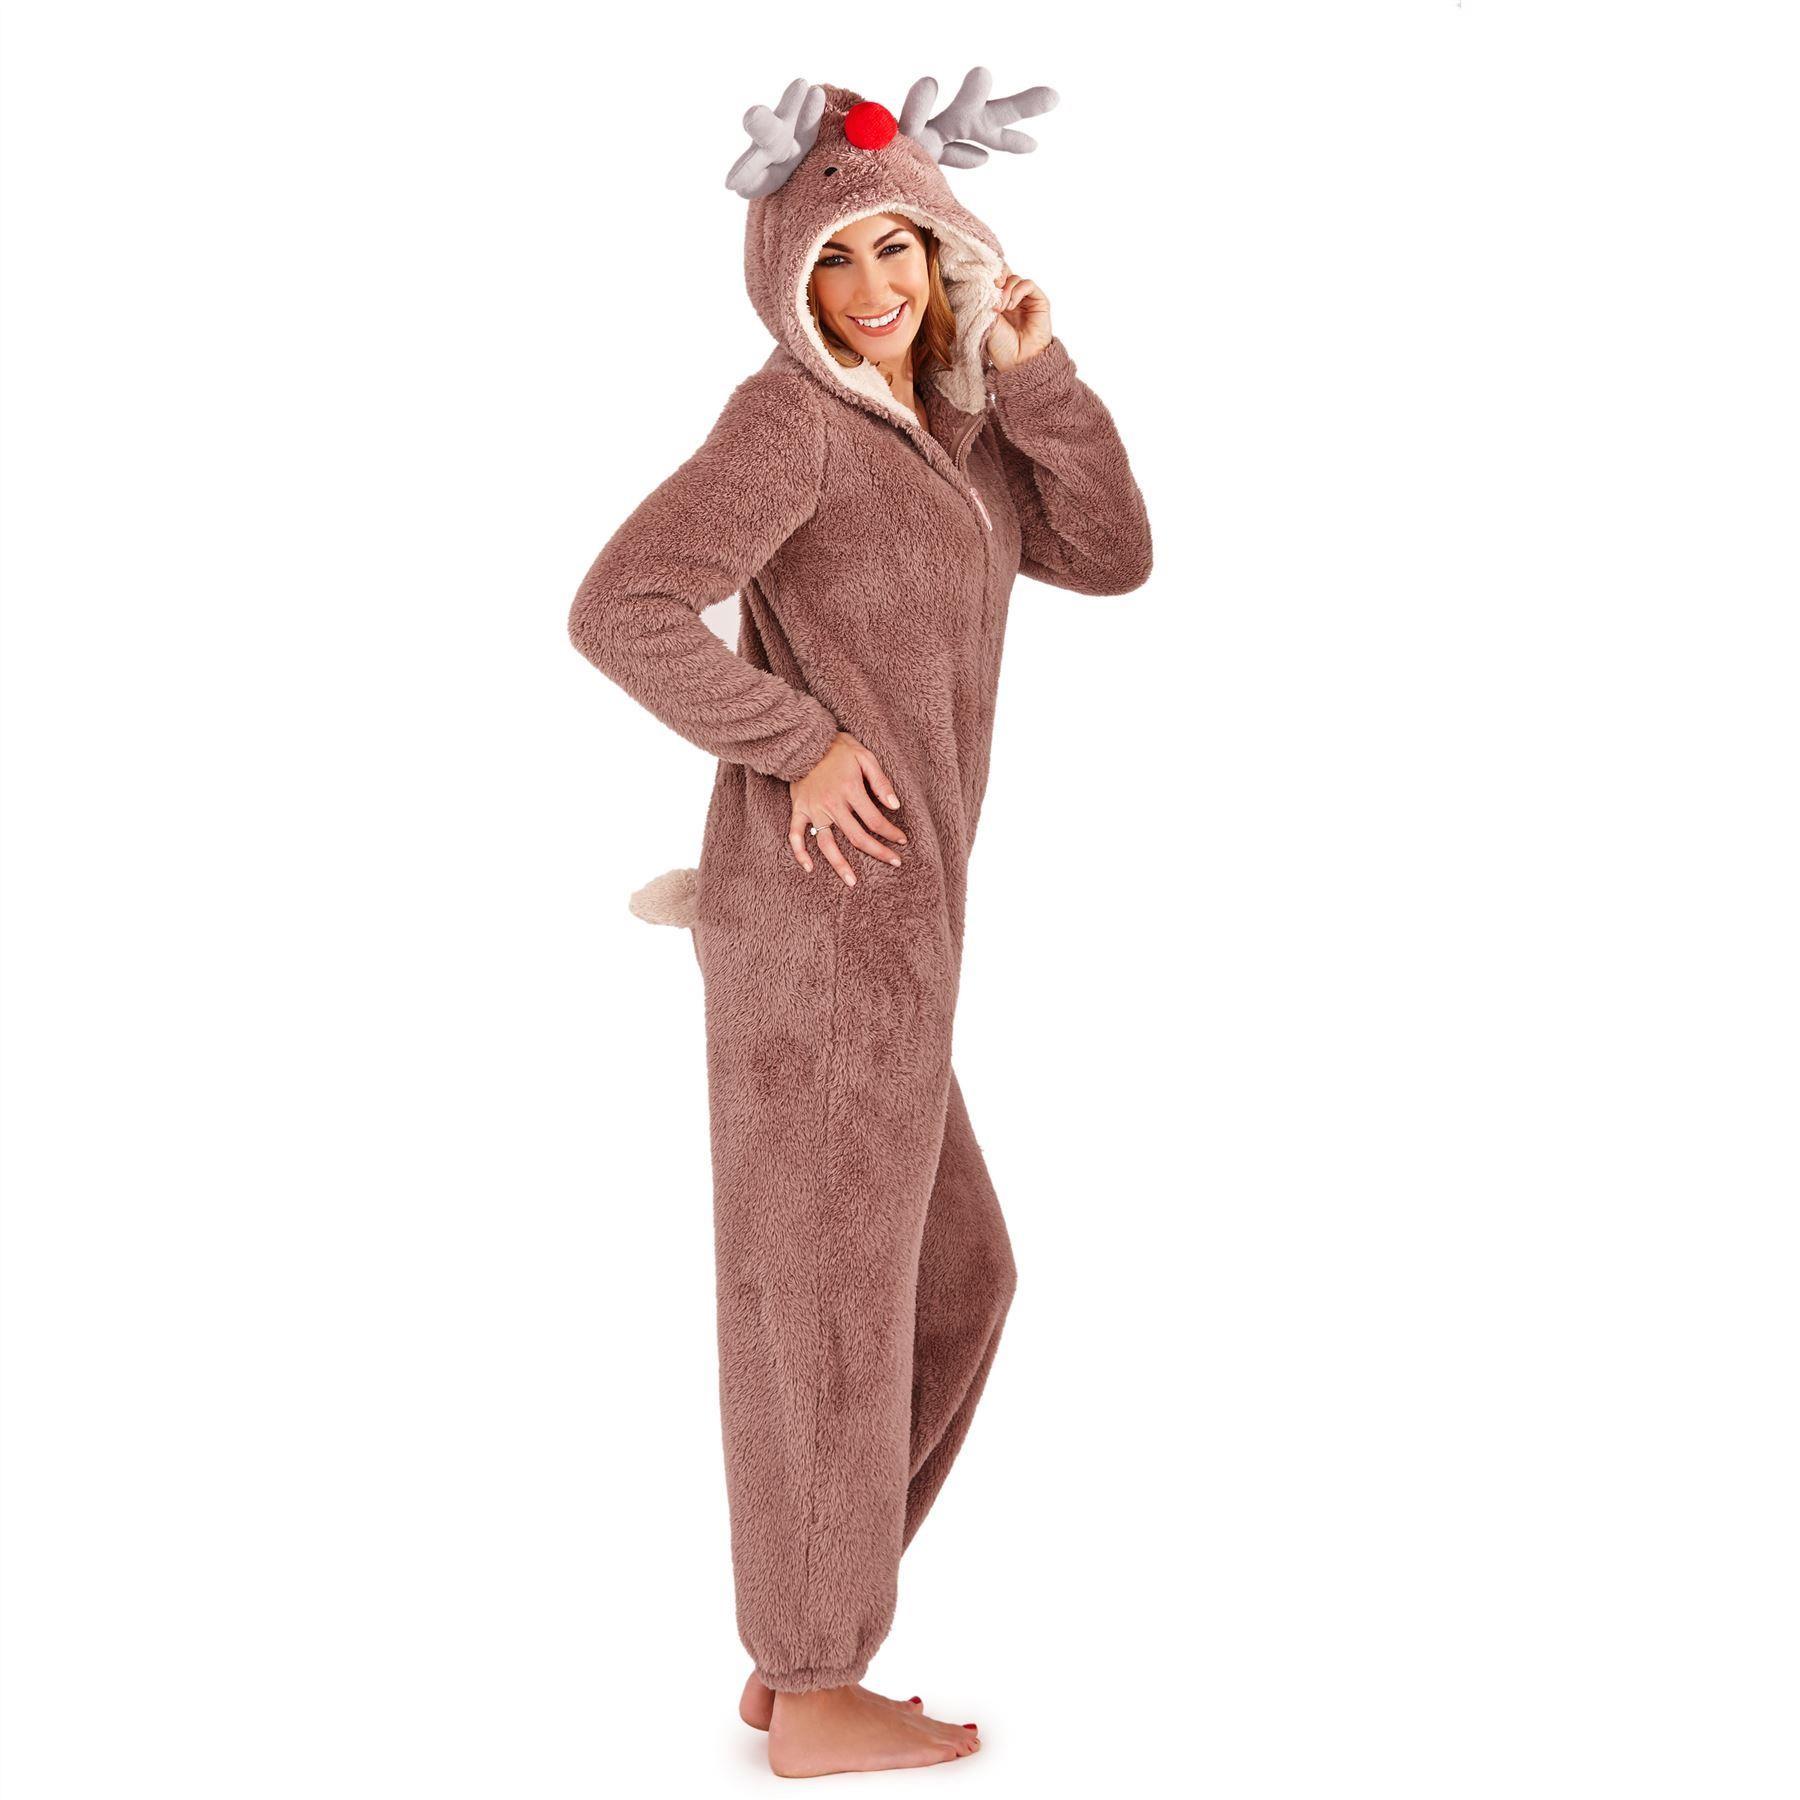 Loungeable Boutique Reindeer Onesie